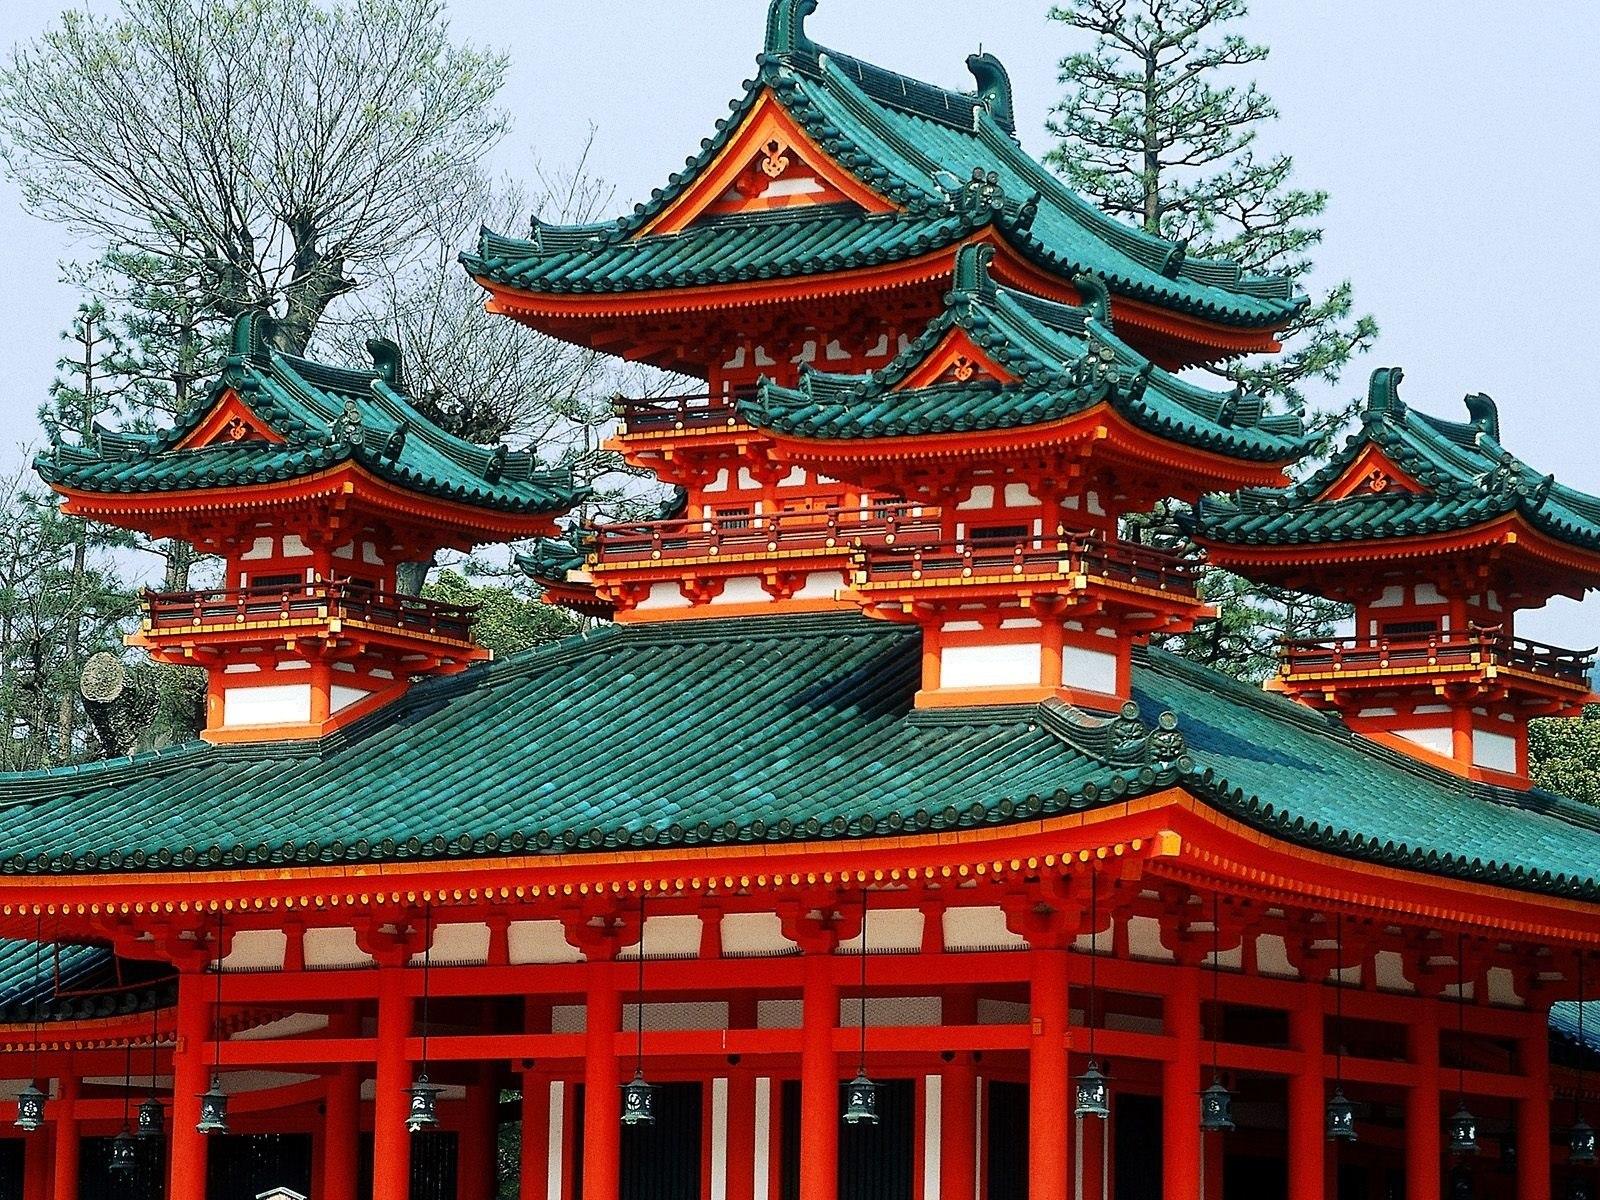 Japan foto: Tempel tage